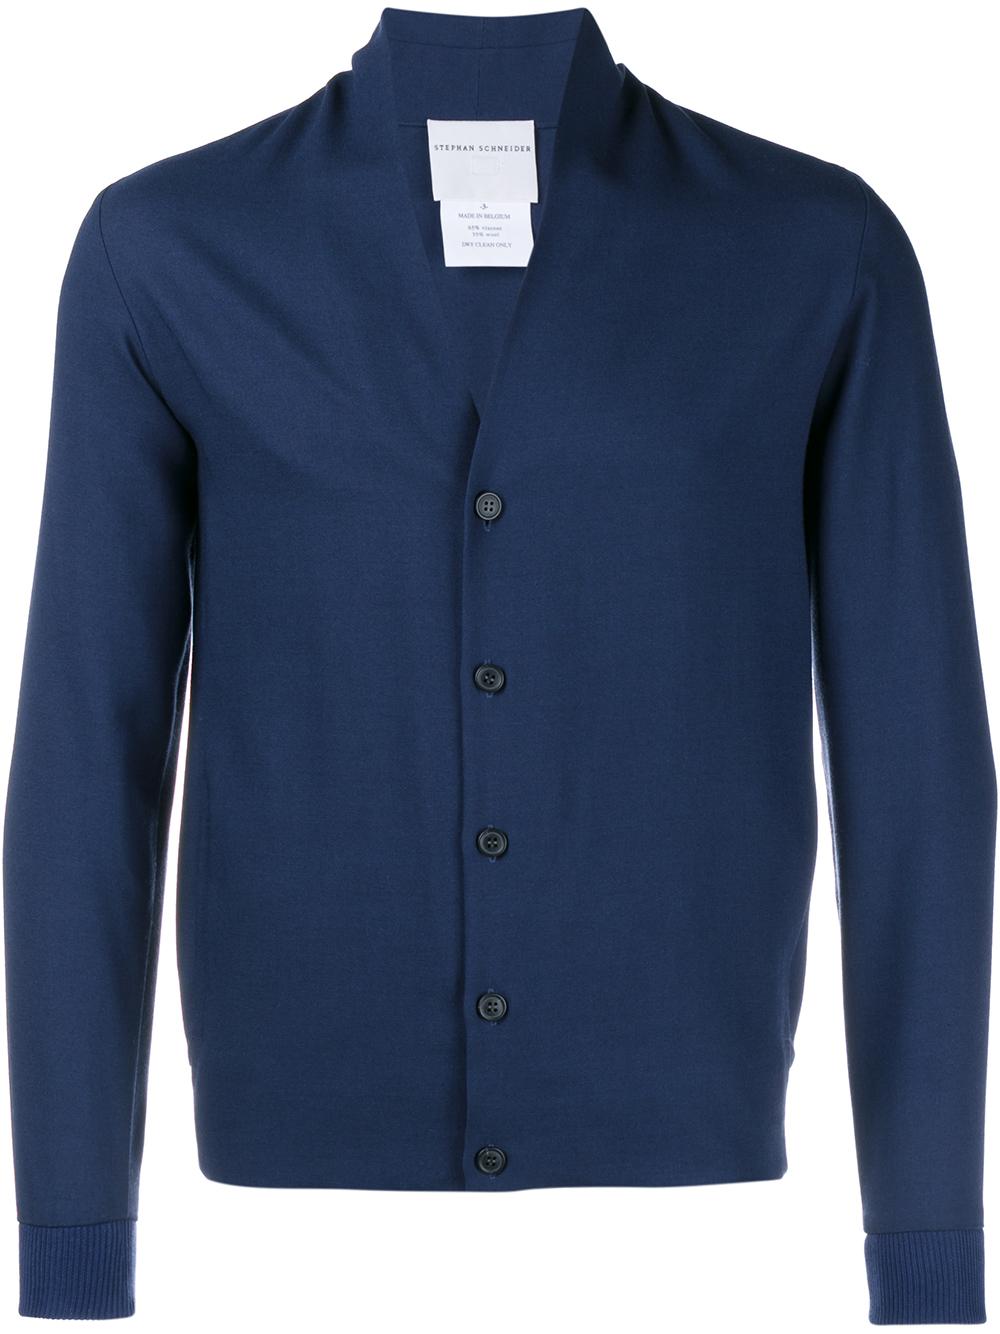 Stephan schneider Long Sleeved Wool Cardigan in Blue for Men | Lyst